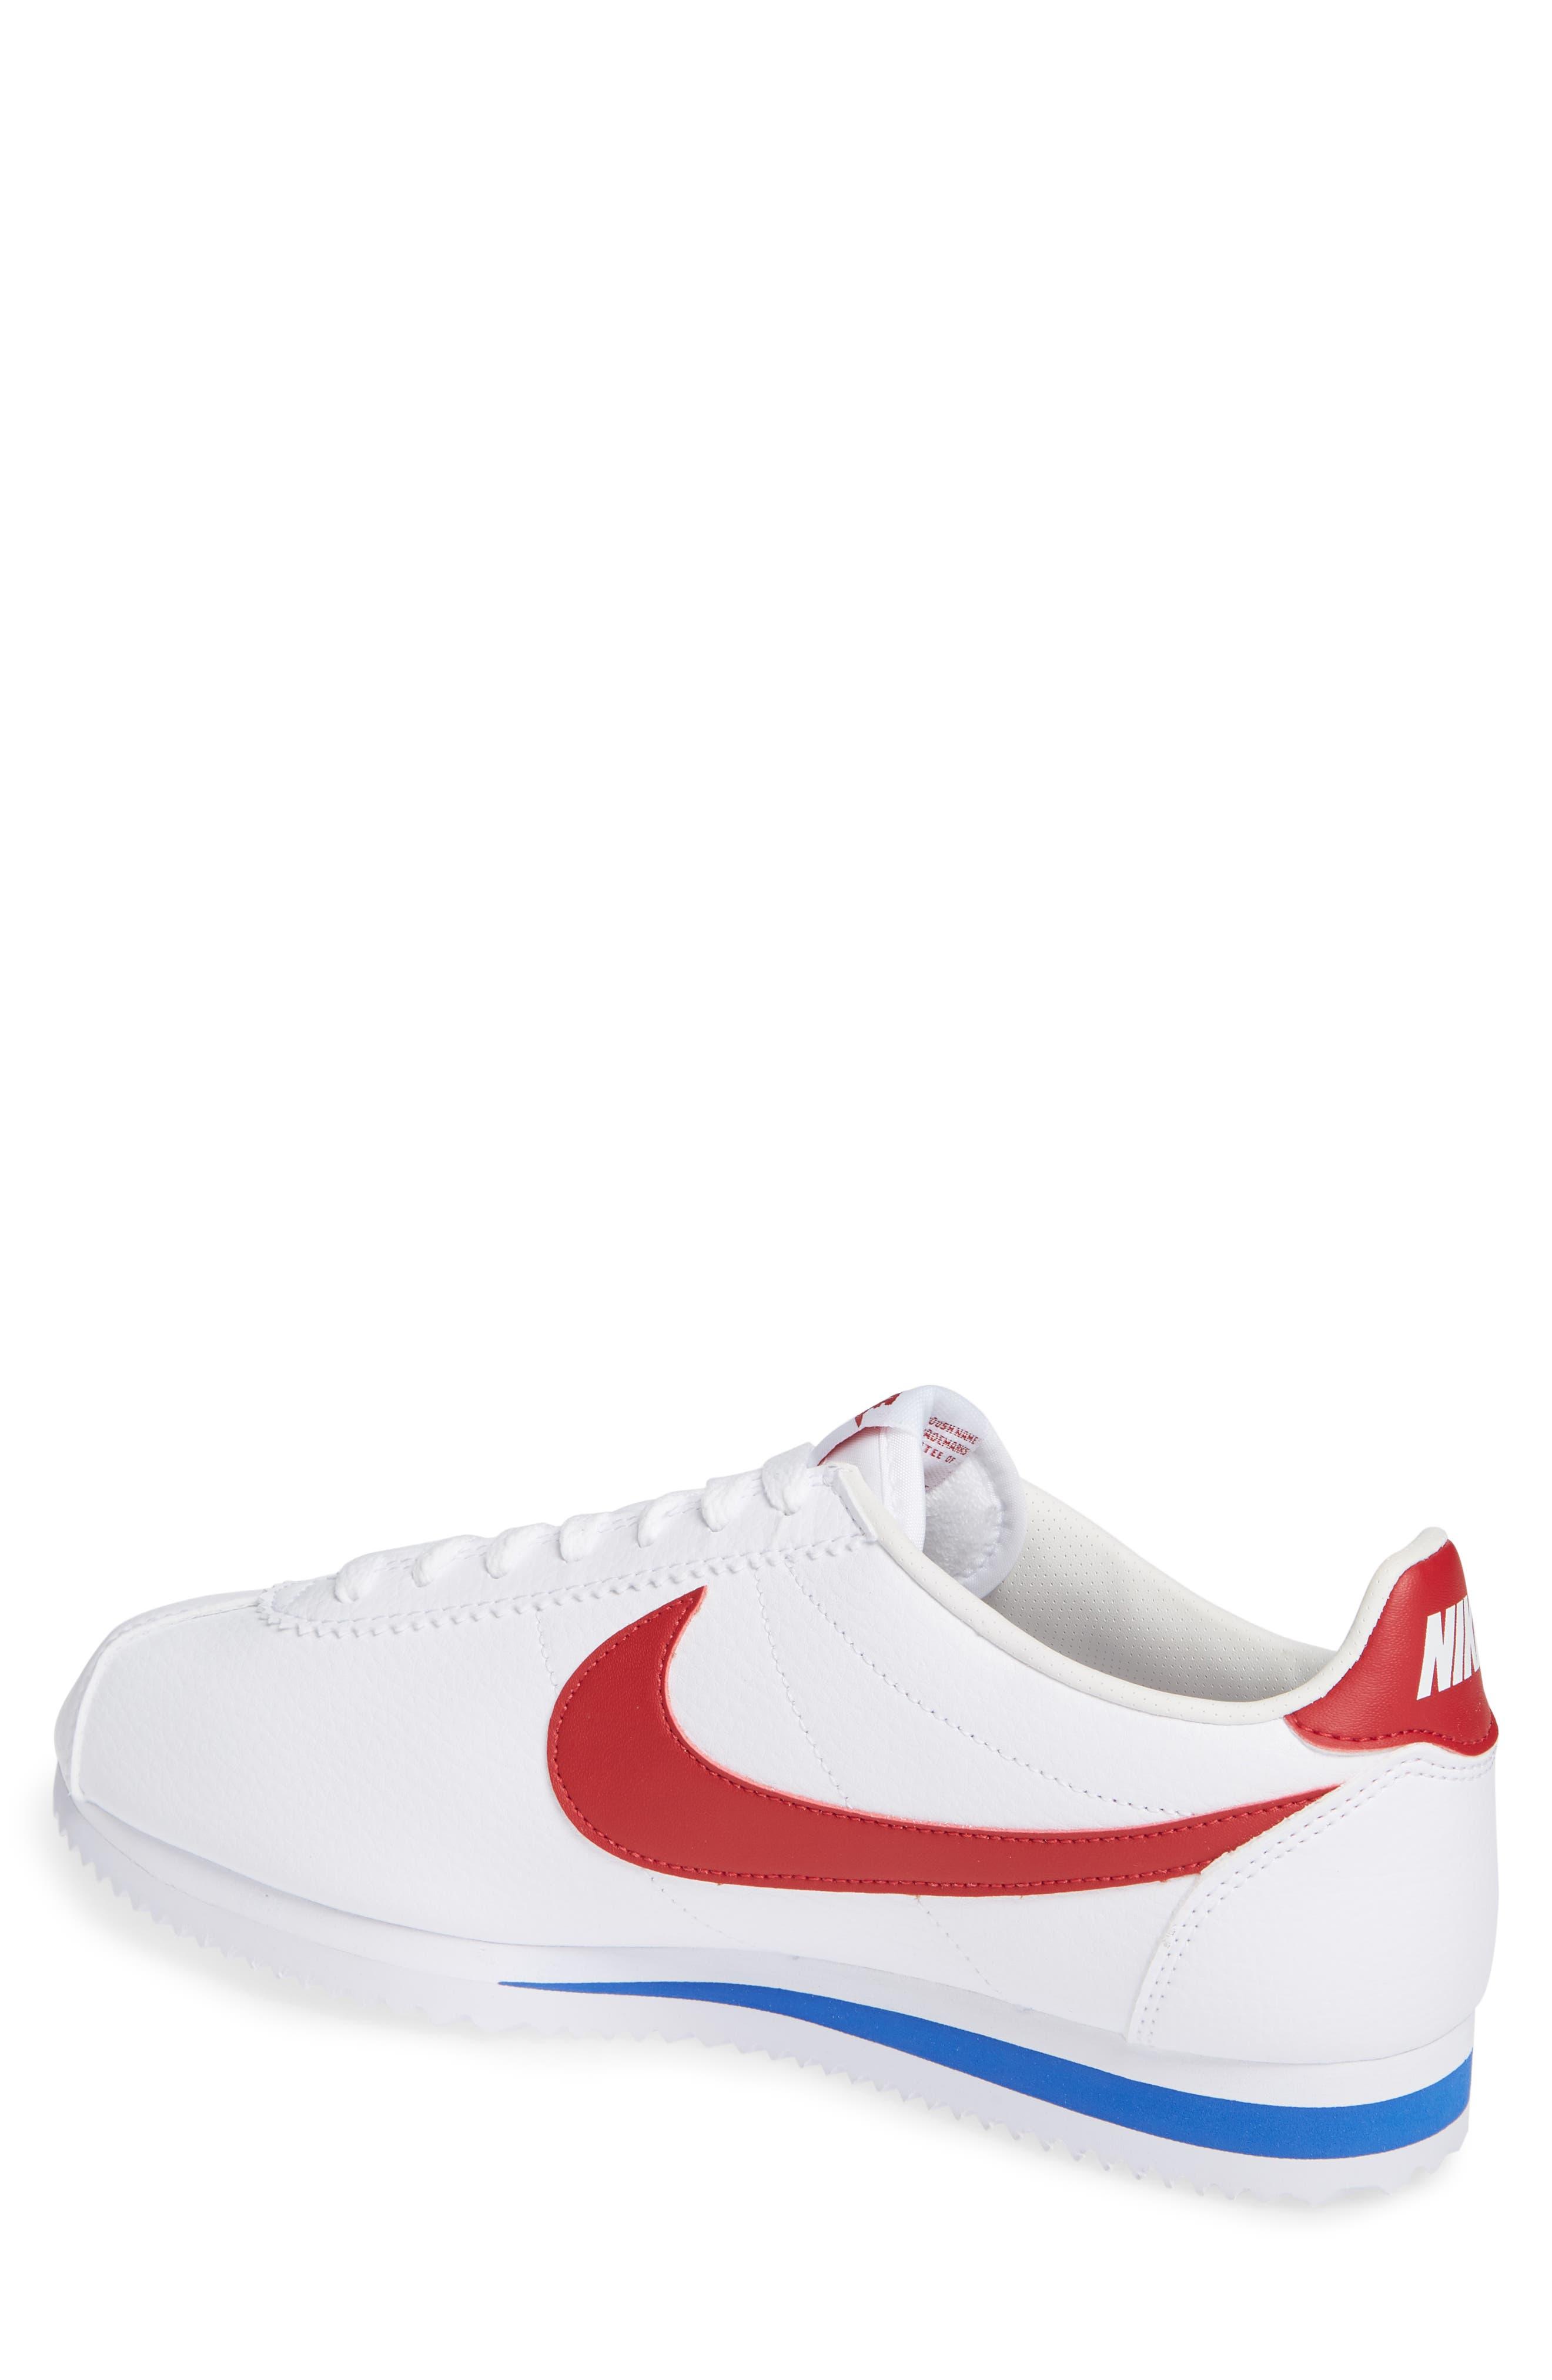 Classic Cortez Sneaker,                             Alternate thumbnail 2, color,                             White/ Varsity Red/ Royal